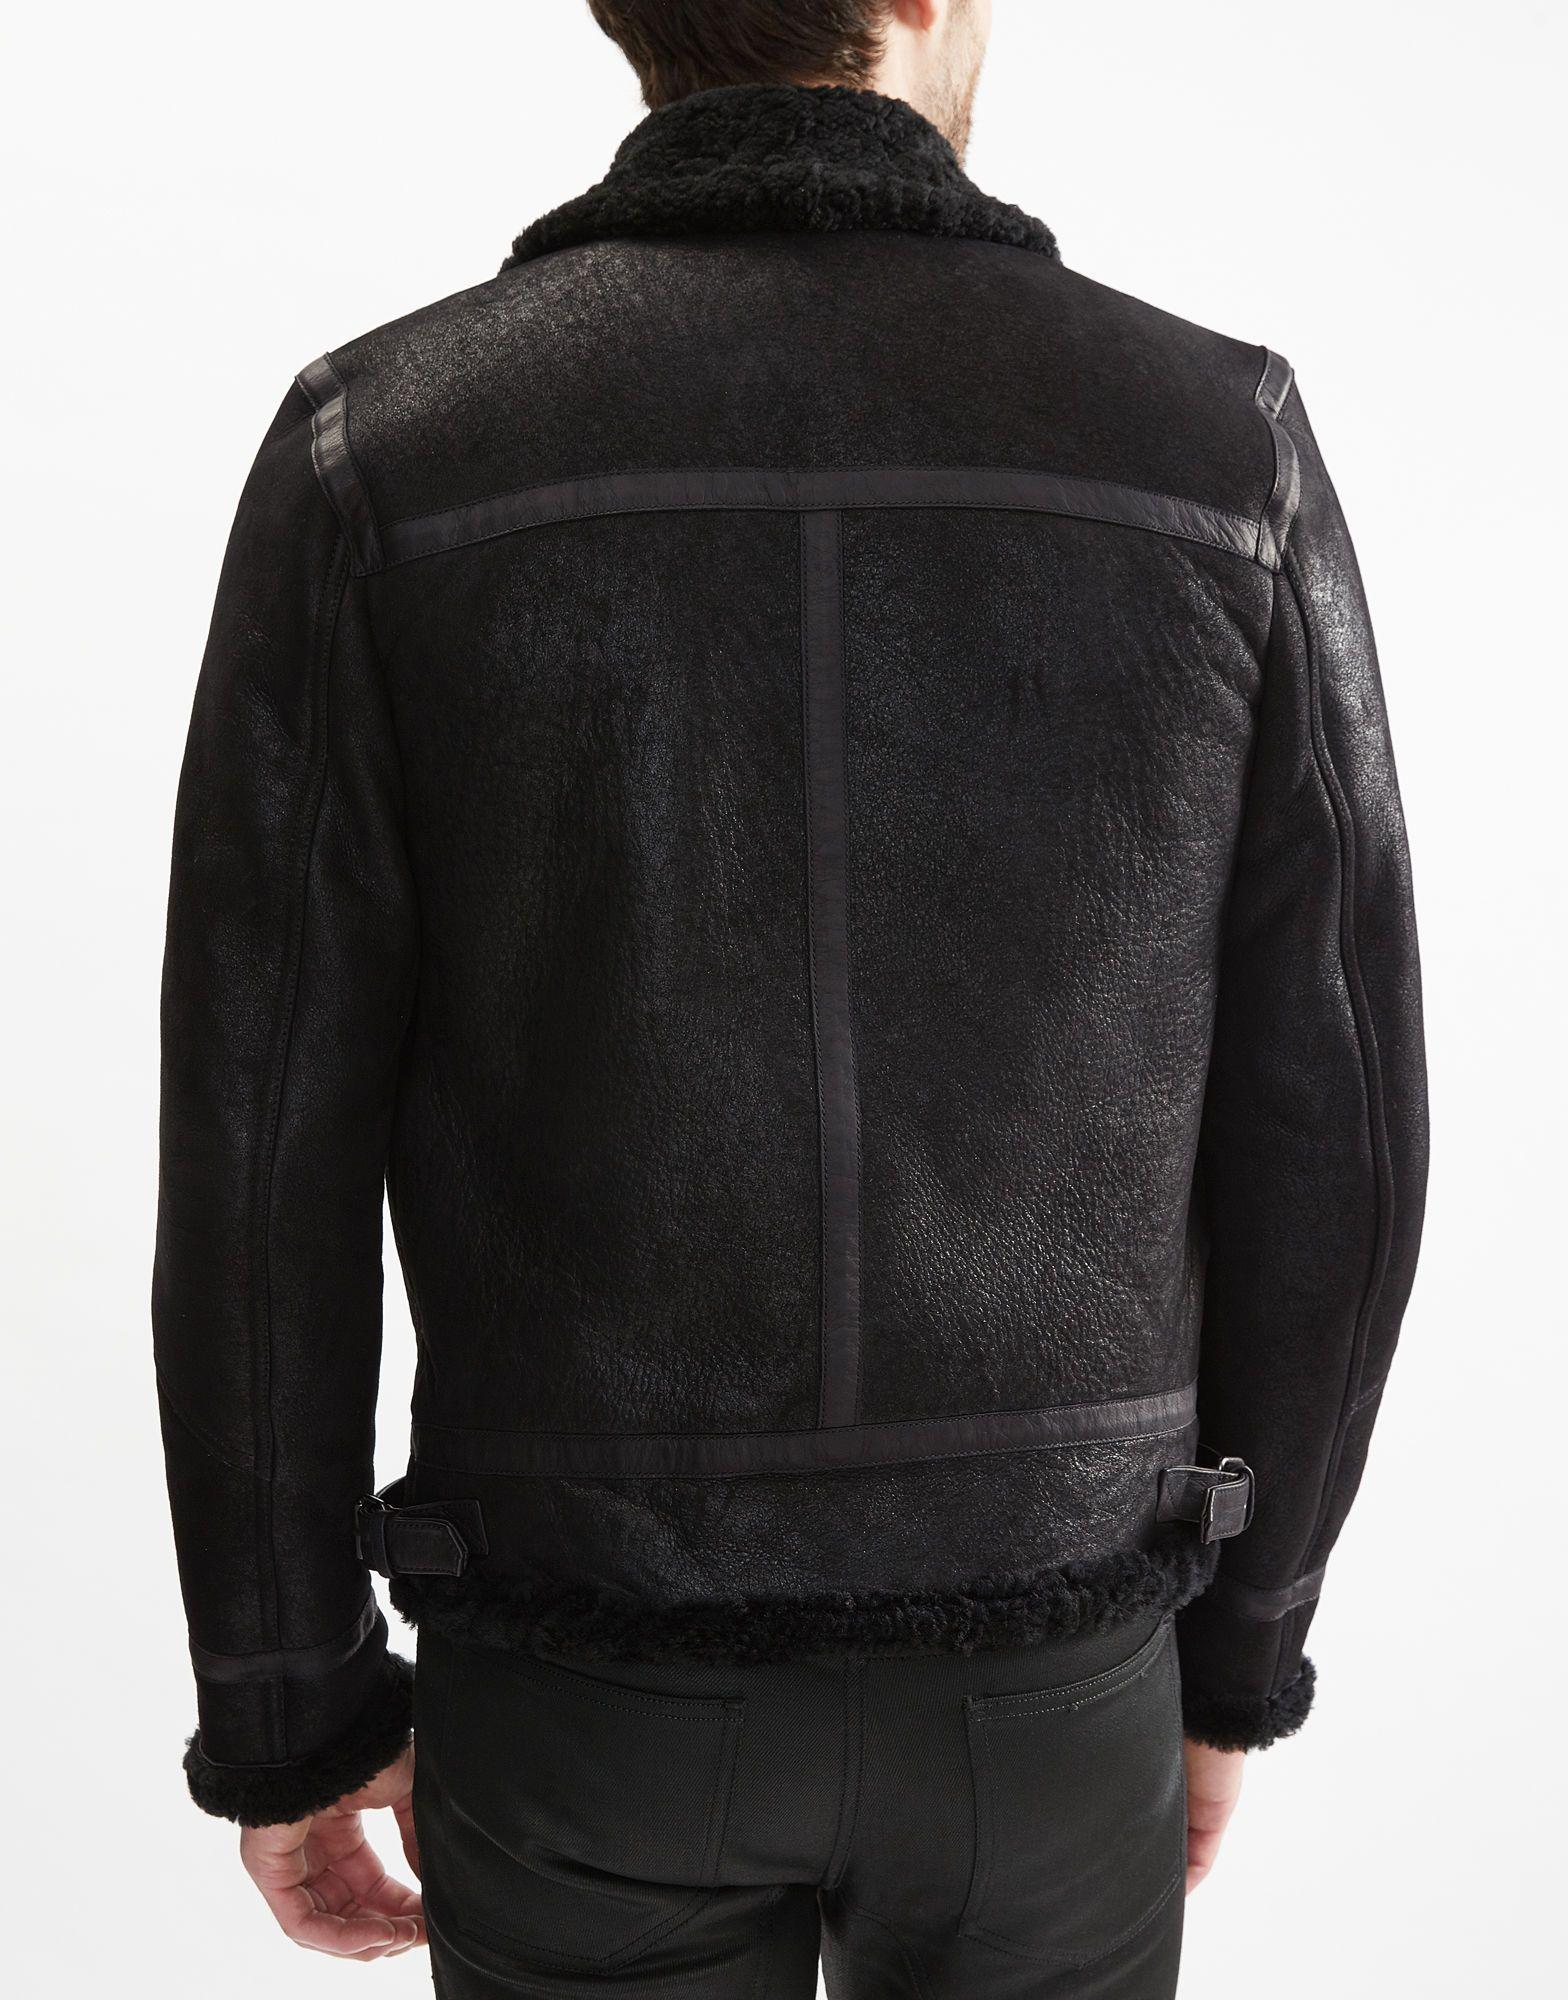 Templewood Shearling Aviator Jacket | Men's Leather Jackets | Belstaff